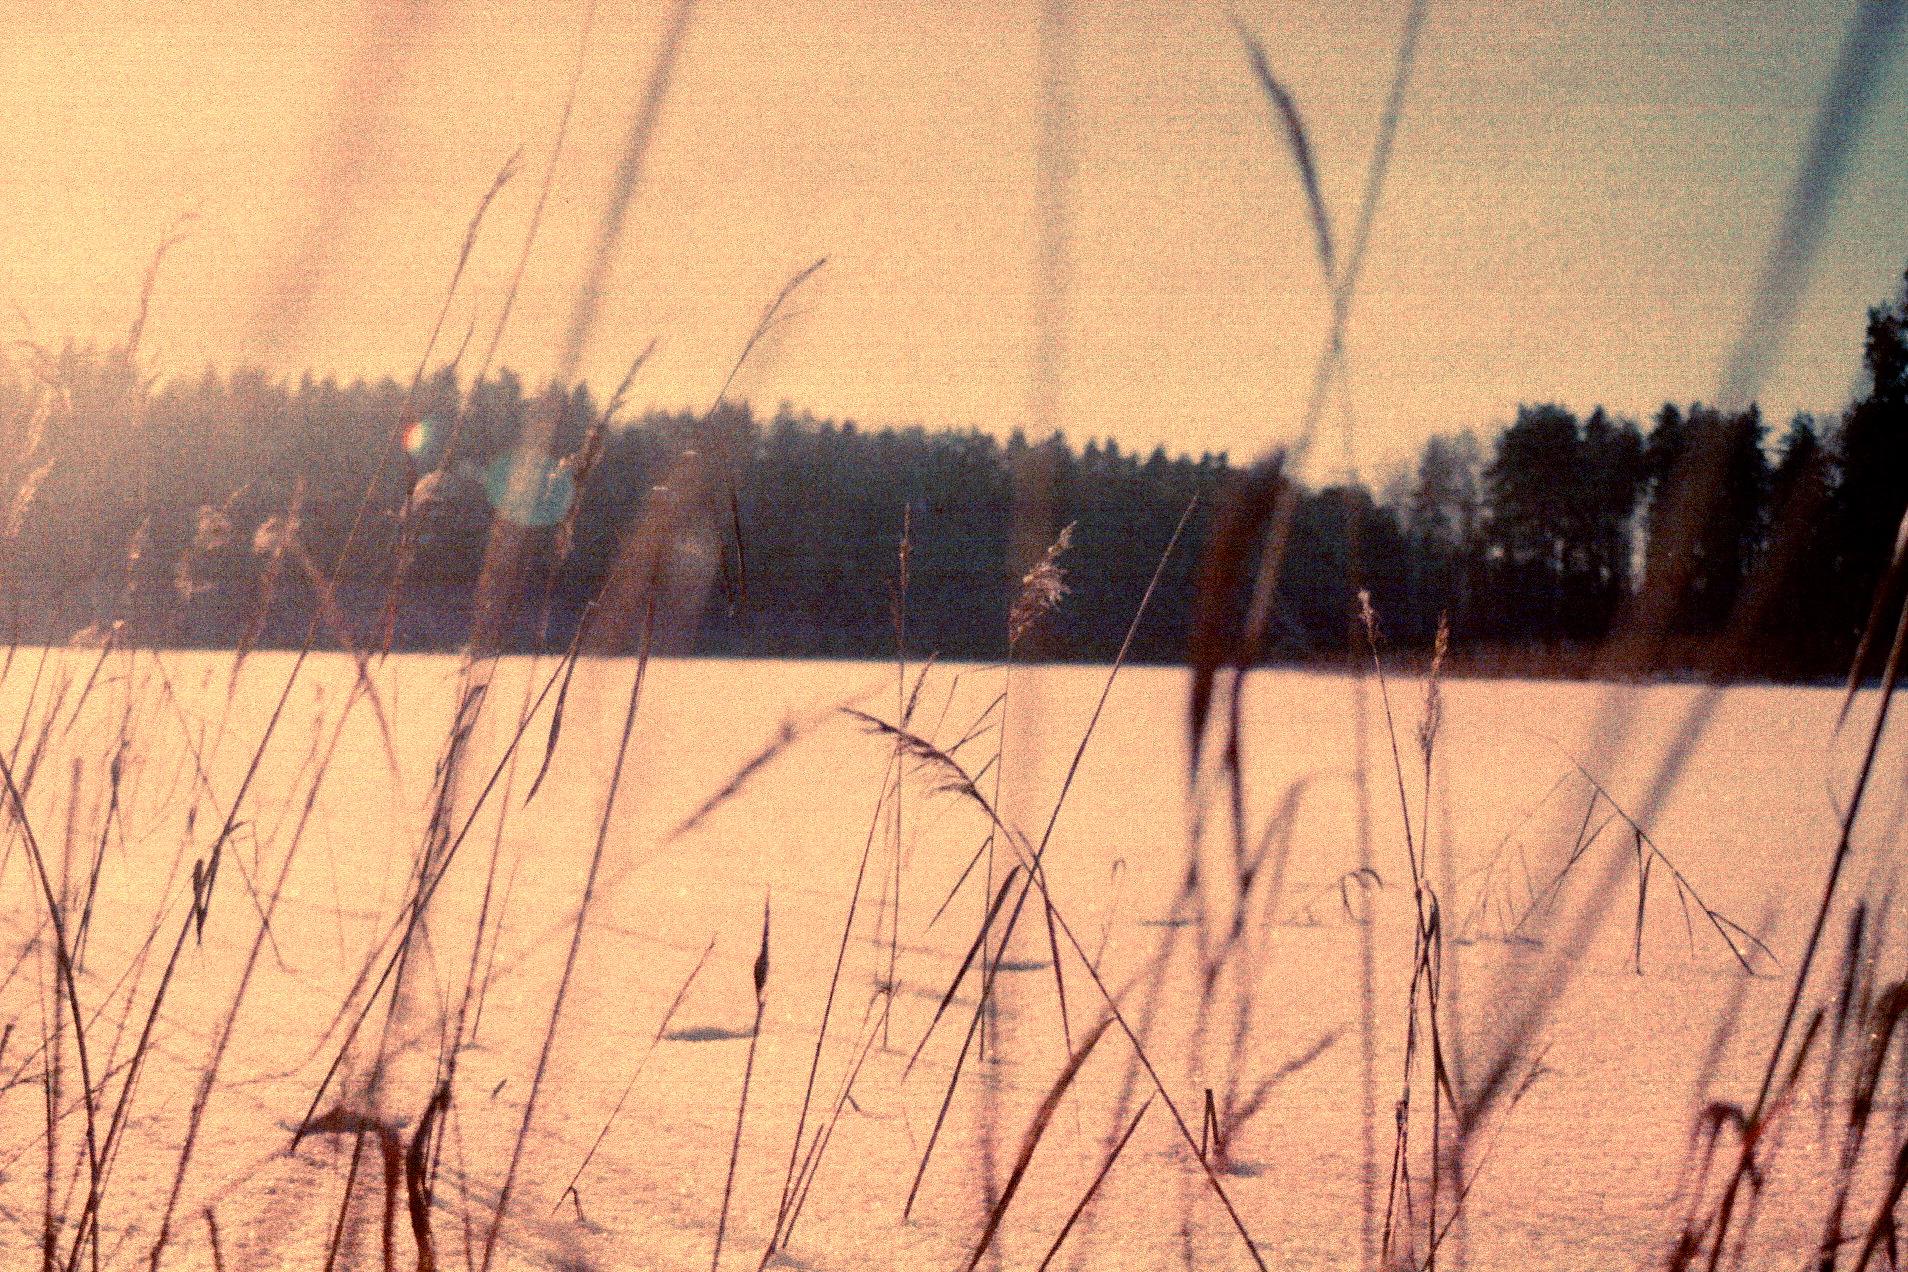 Where live dead grass